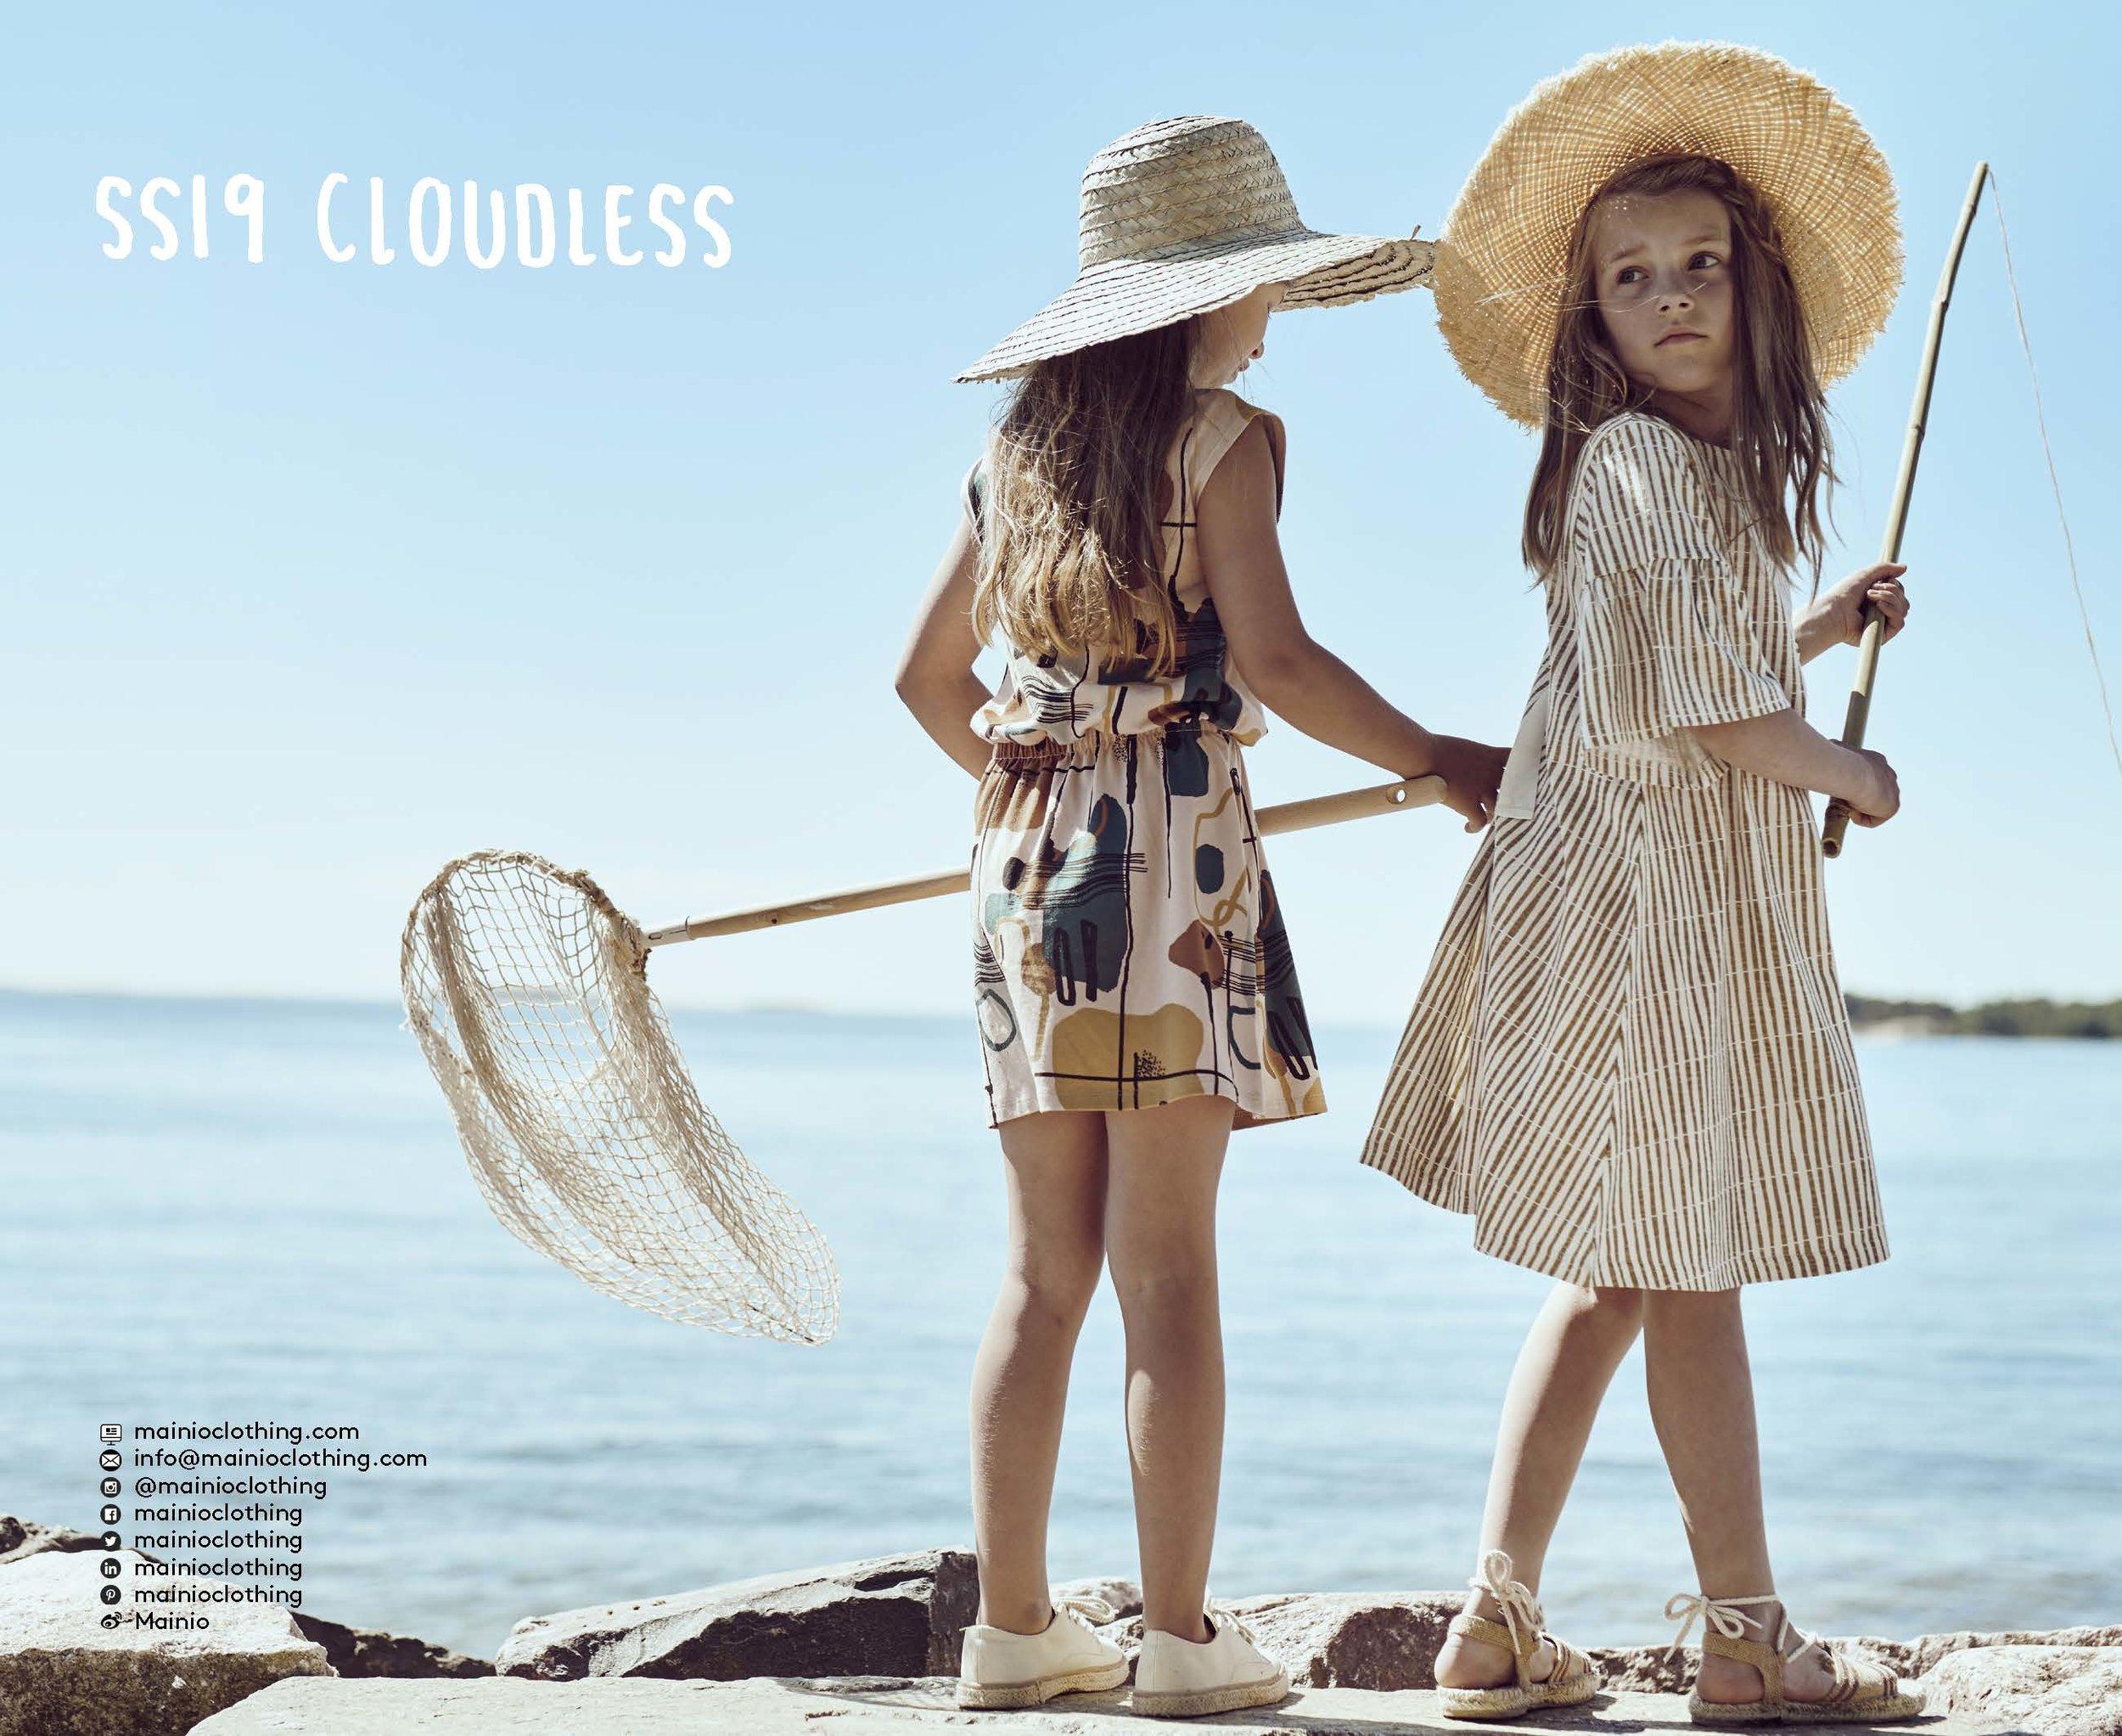 mainio_cloudless_ss19_lookbook_Page_16.jpg